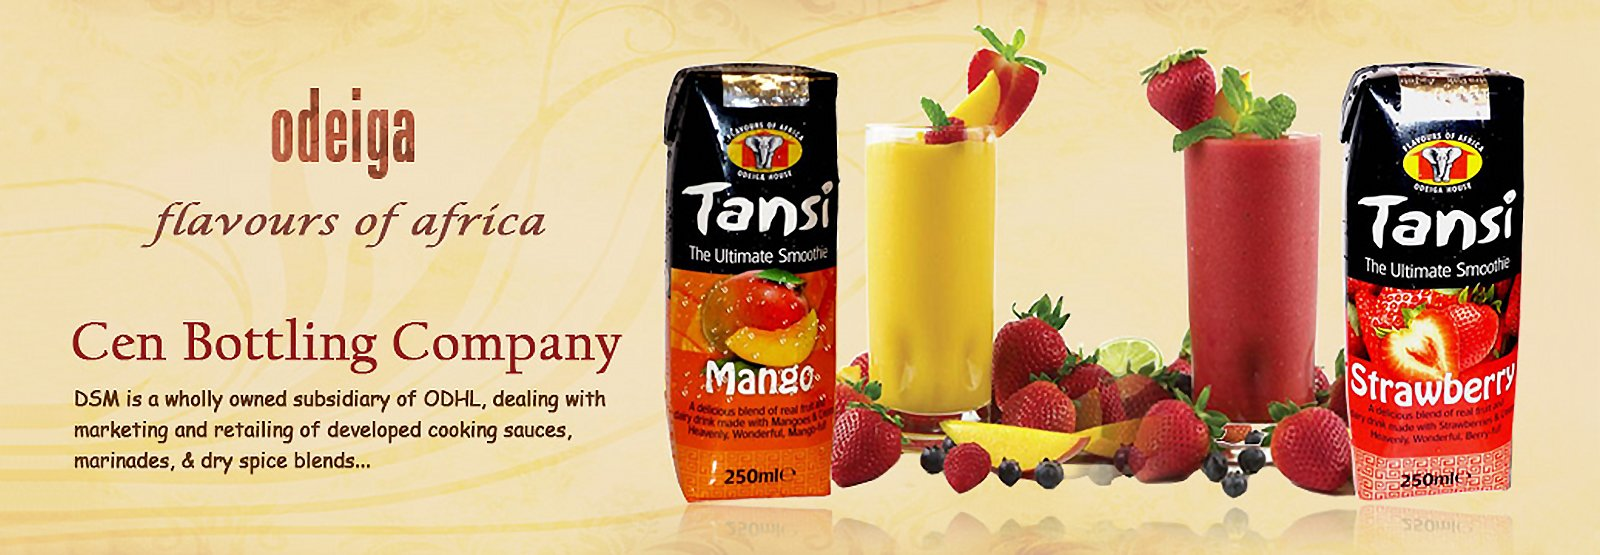 tansi healthy mango smoothie juice